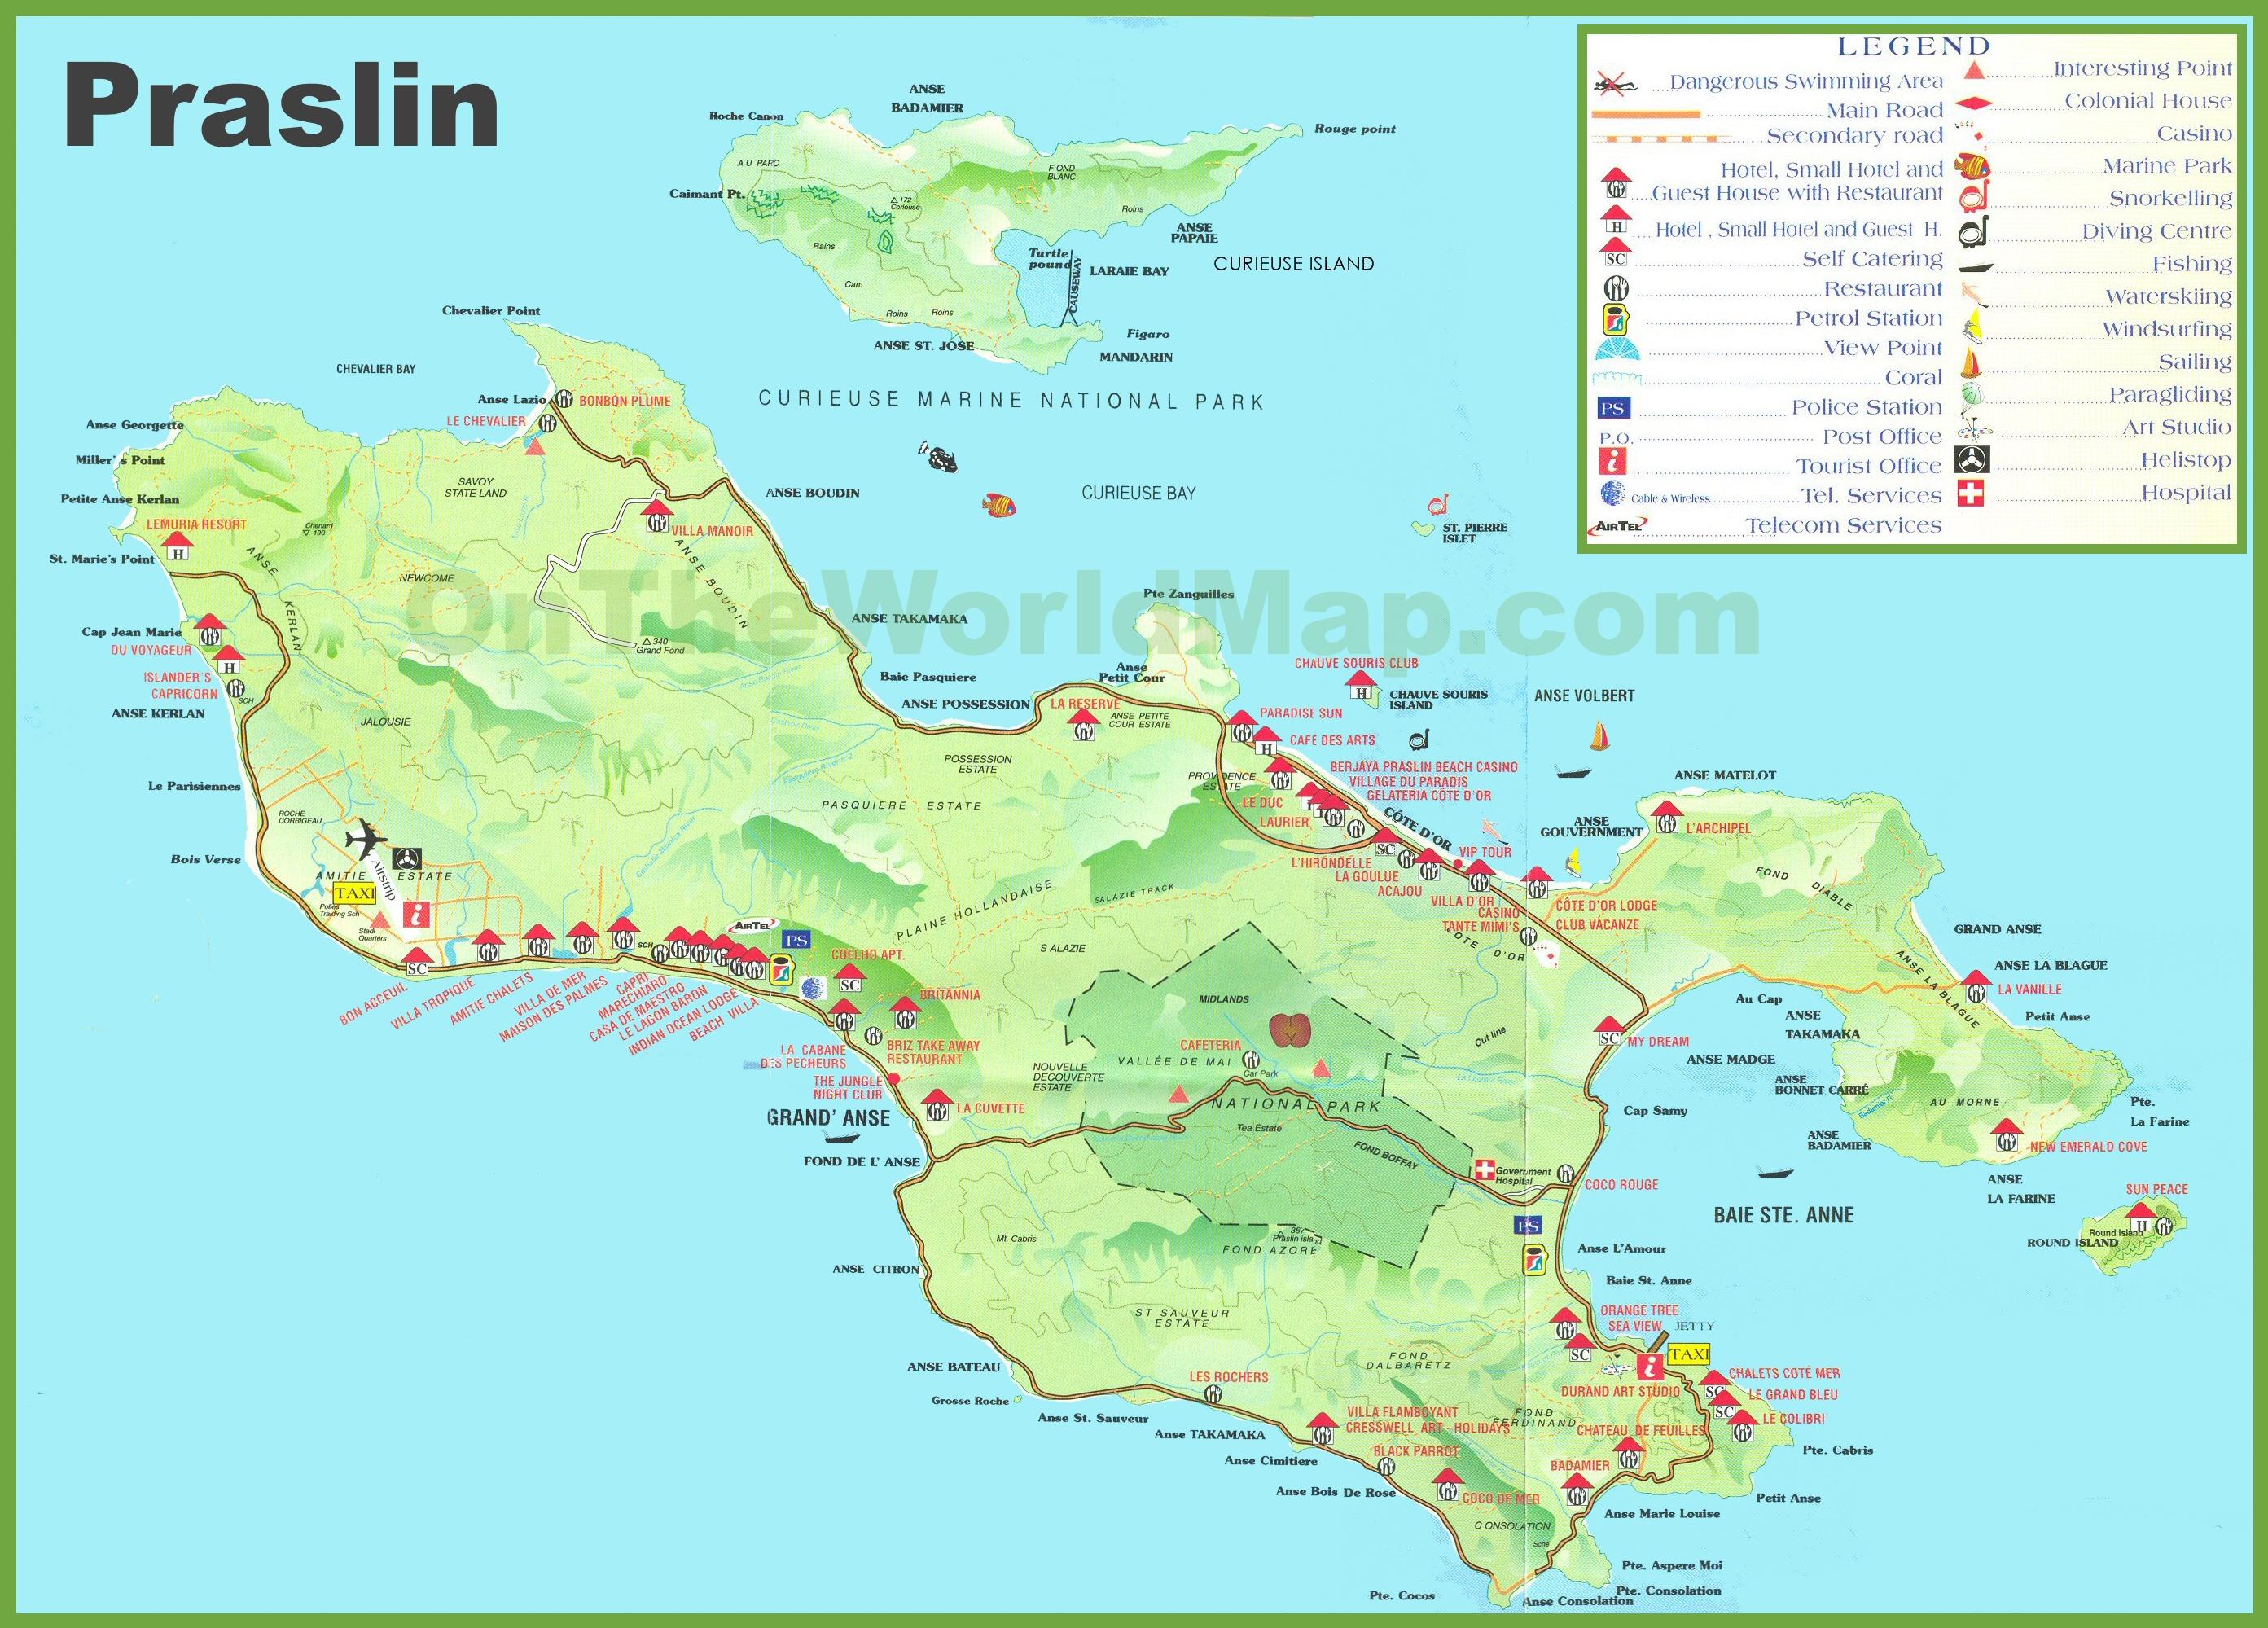 Praslin Island Seychelles World Map Large detailed tourist map of Praslin island